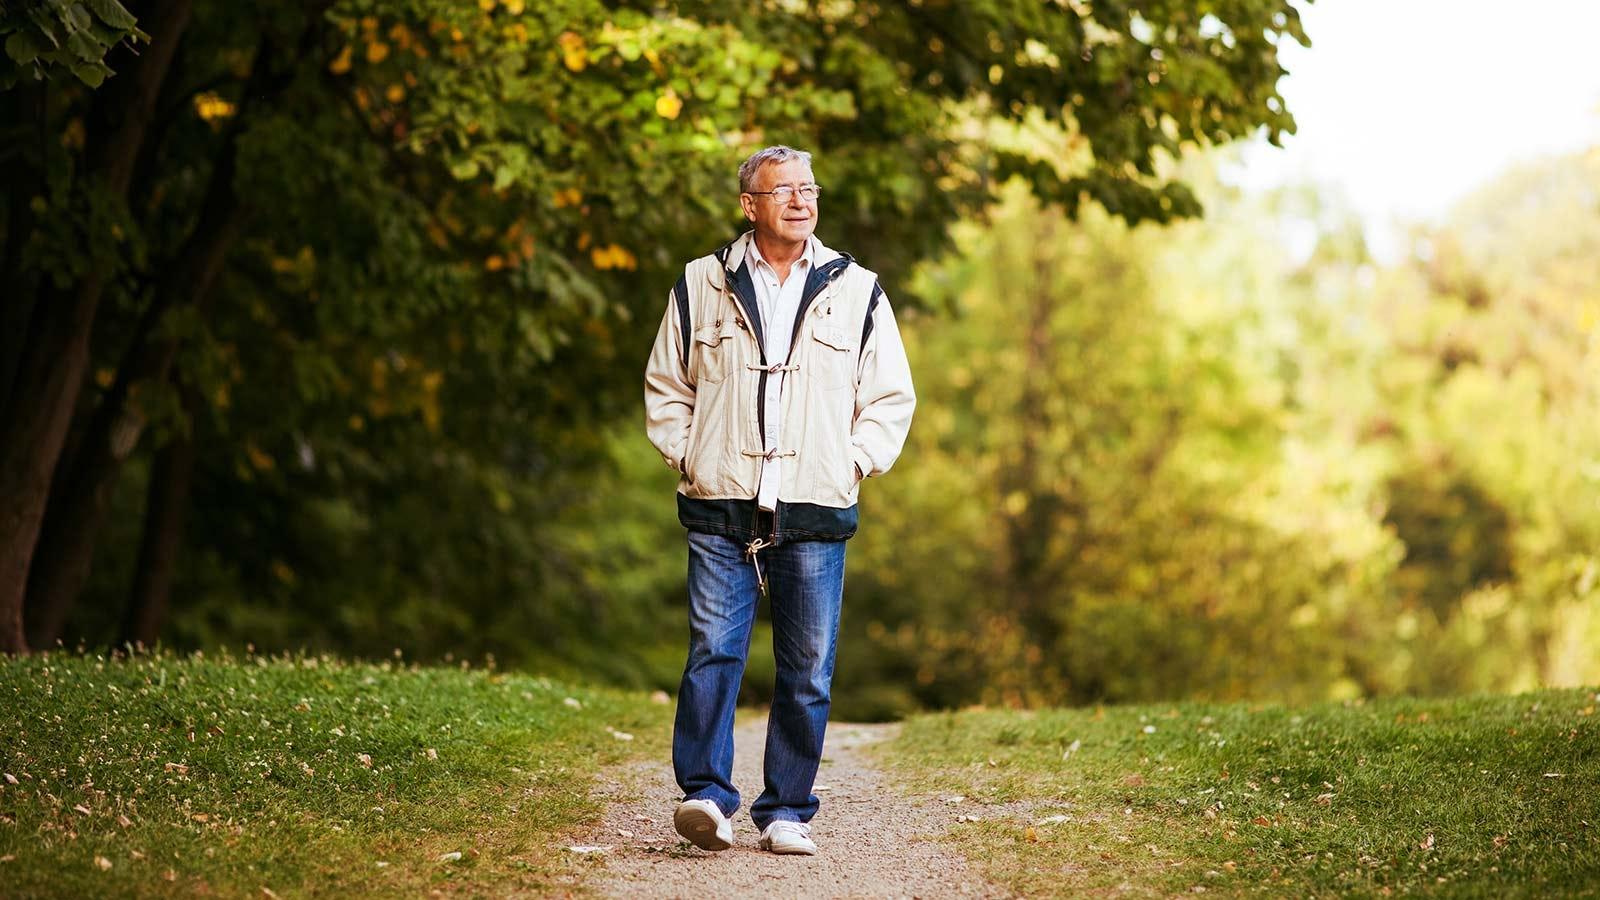 An older man walking in the park, reflecting as he strolls.